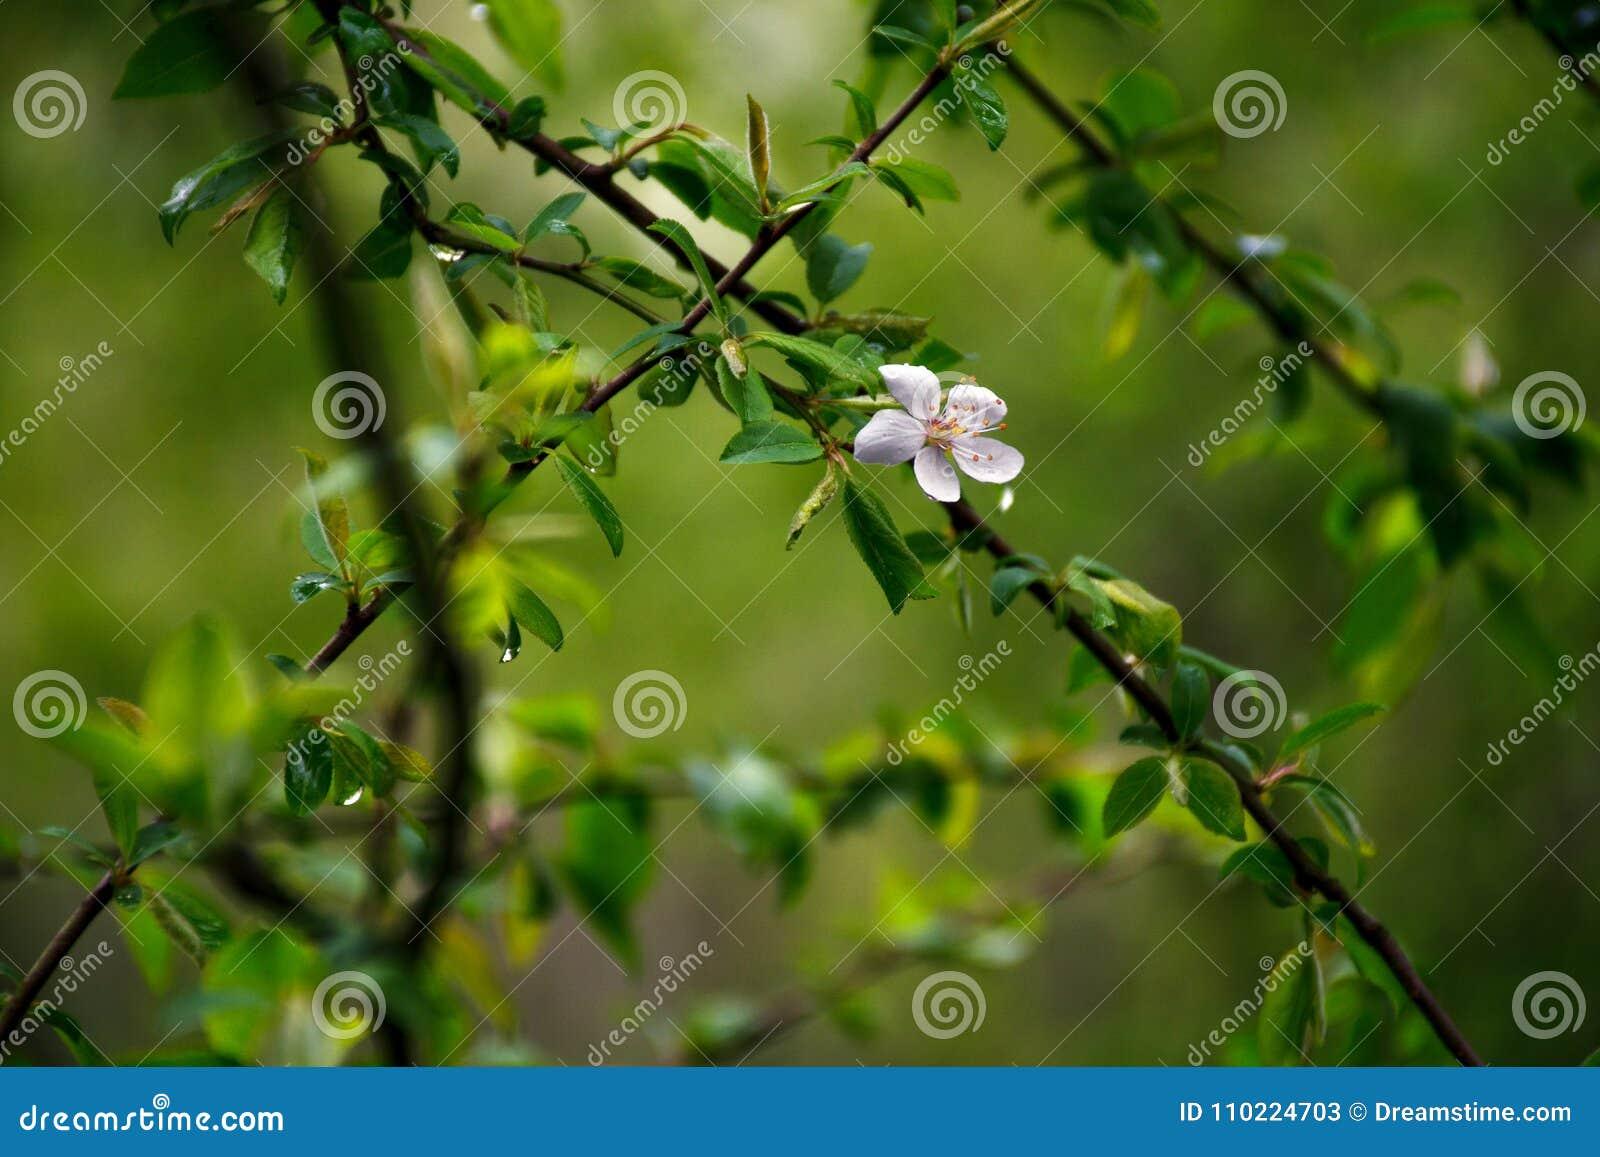 Flowering plum trees the first spring flowers stock image image flowering plum trees the first spring flowers mightylinksfo